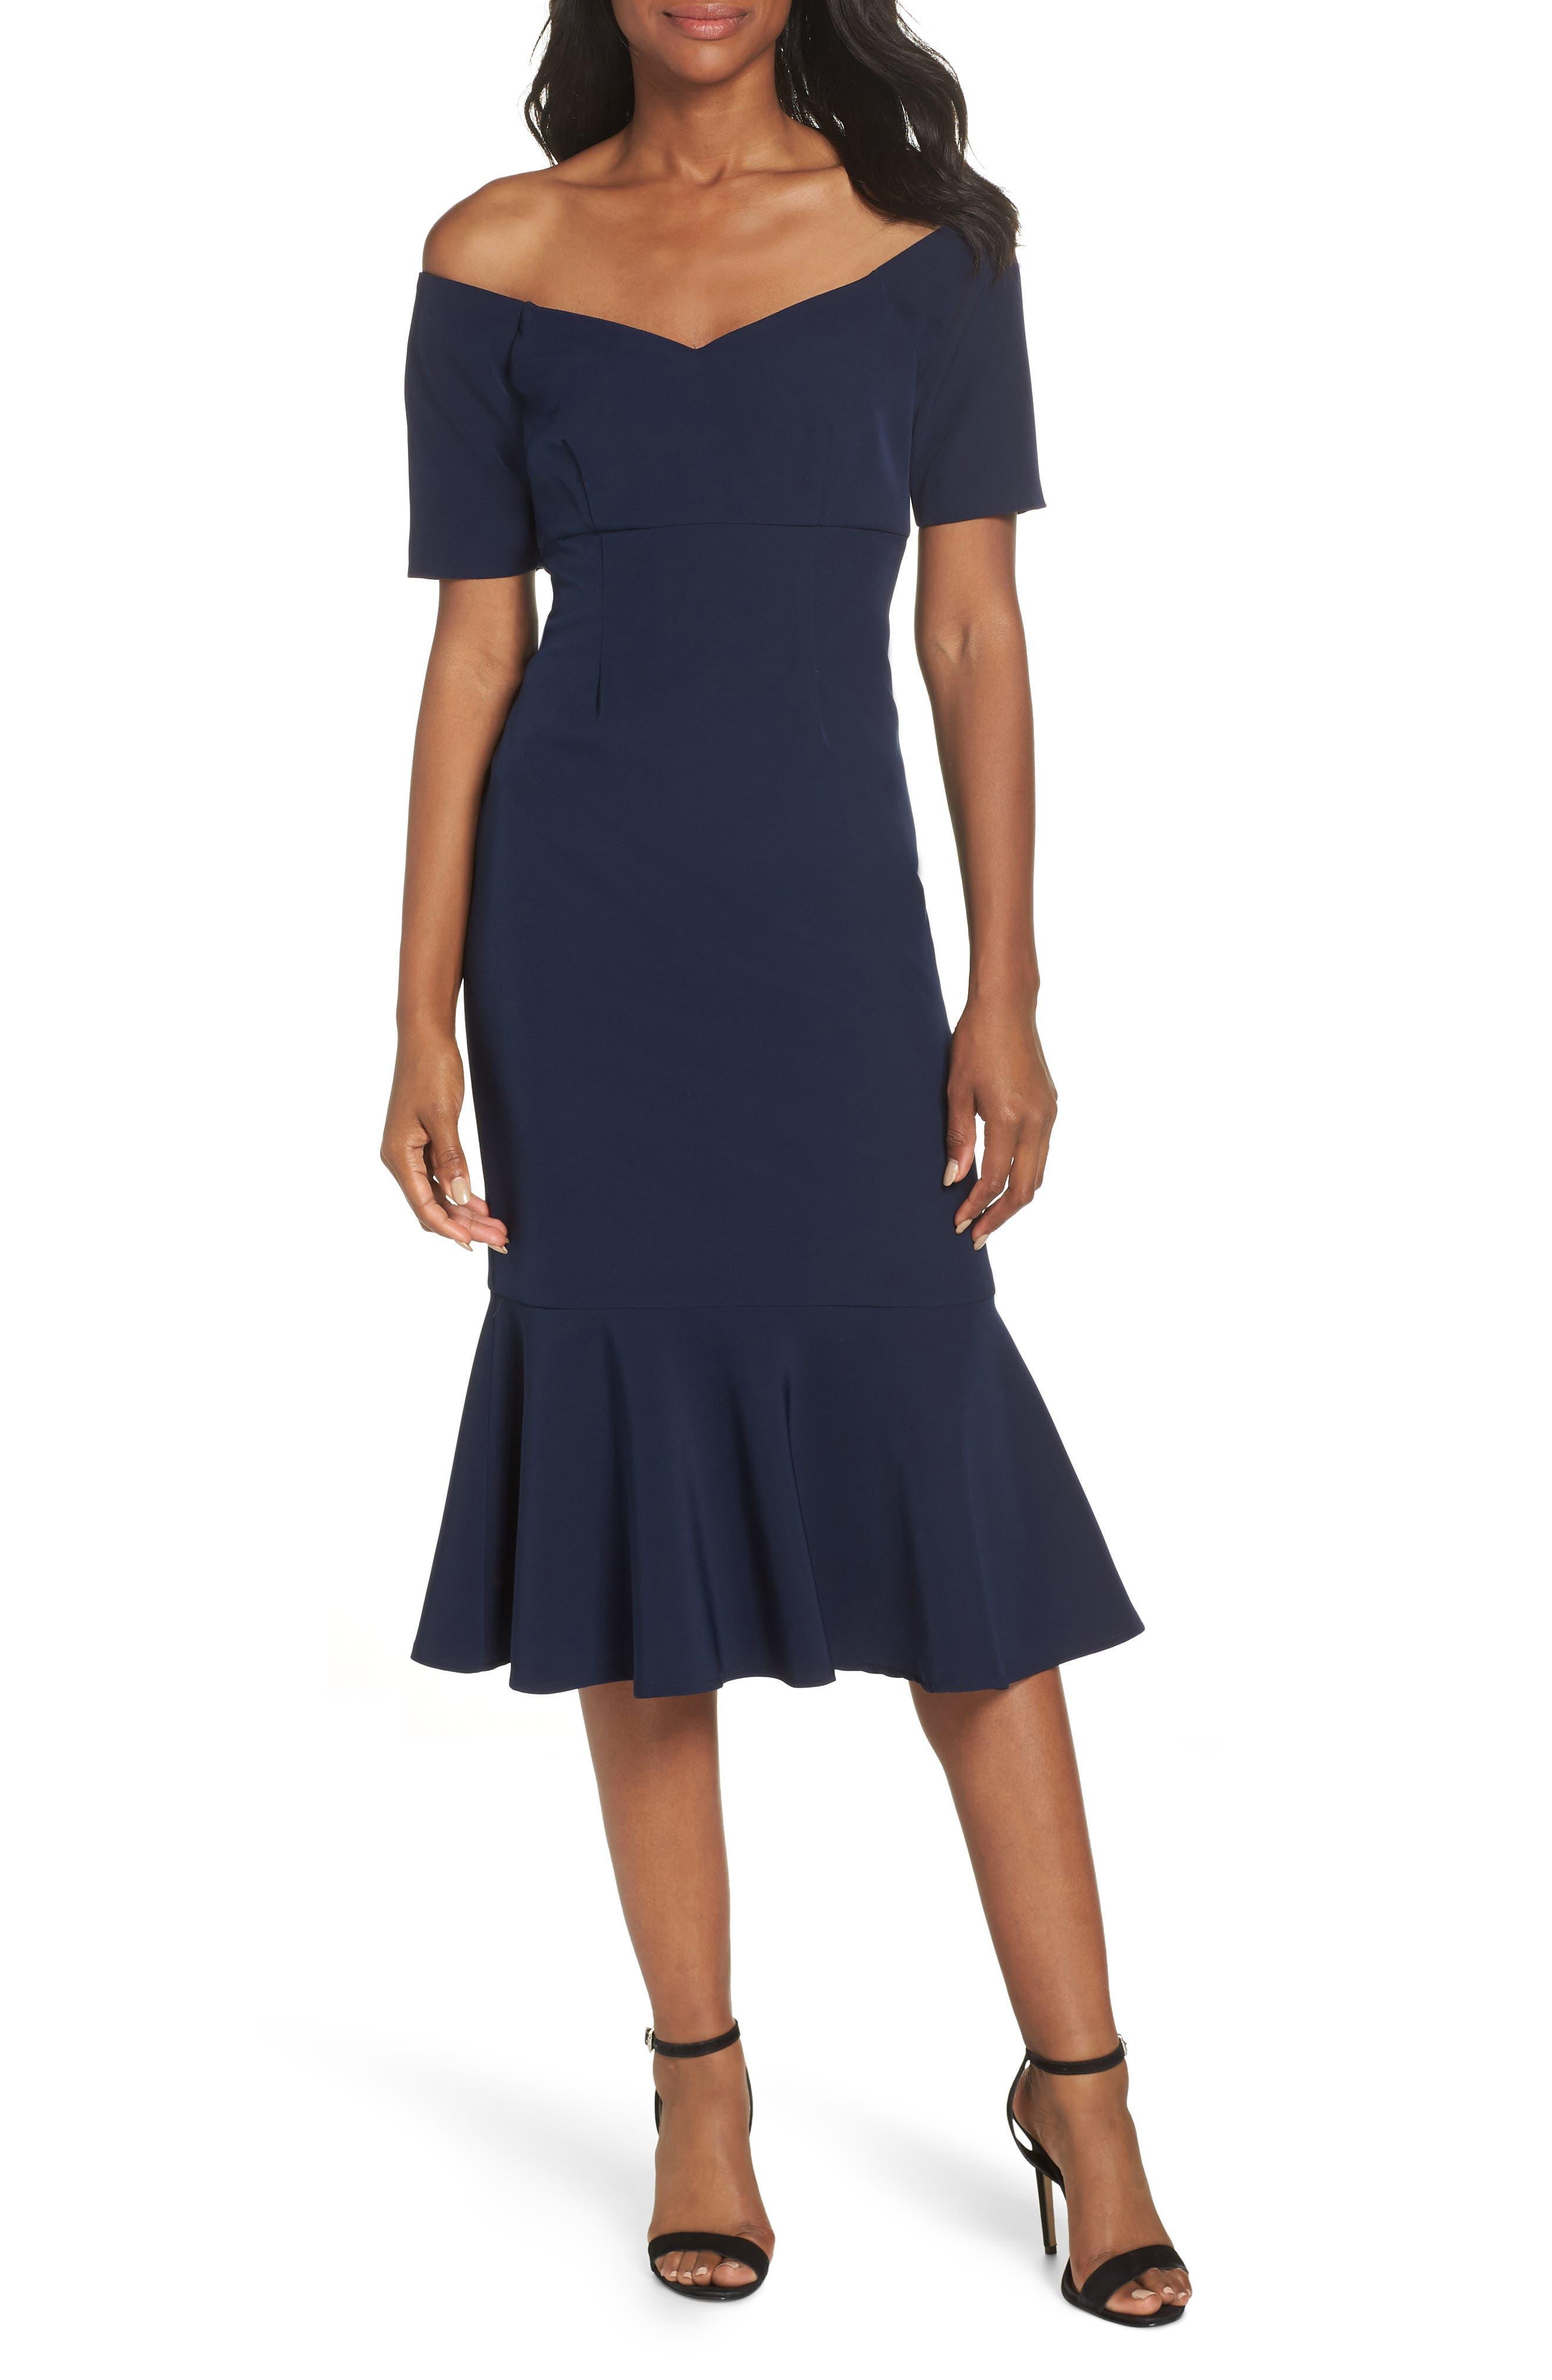 Maggy London Dresses